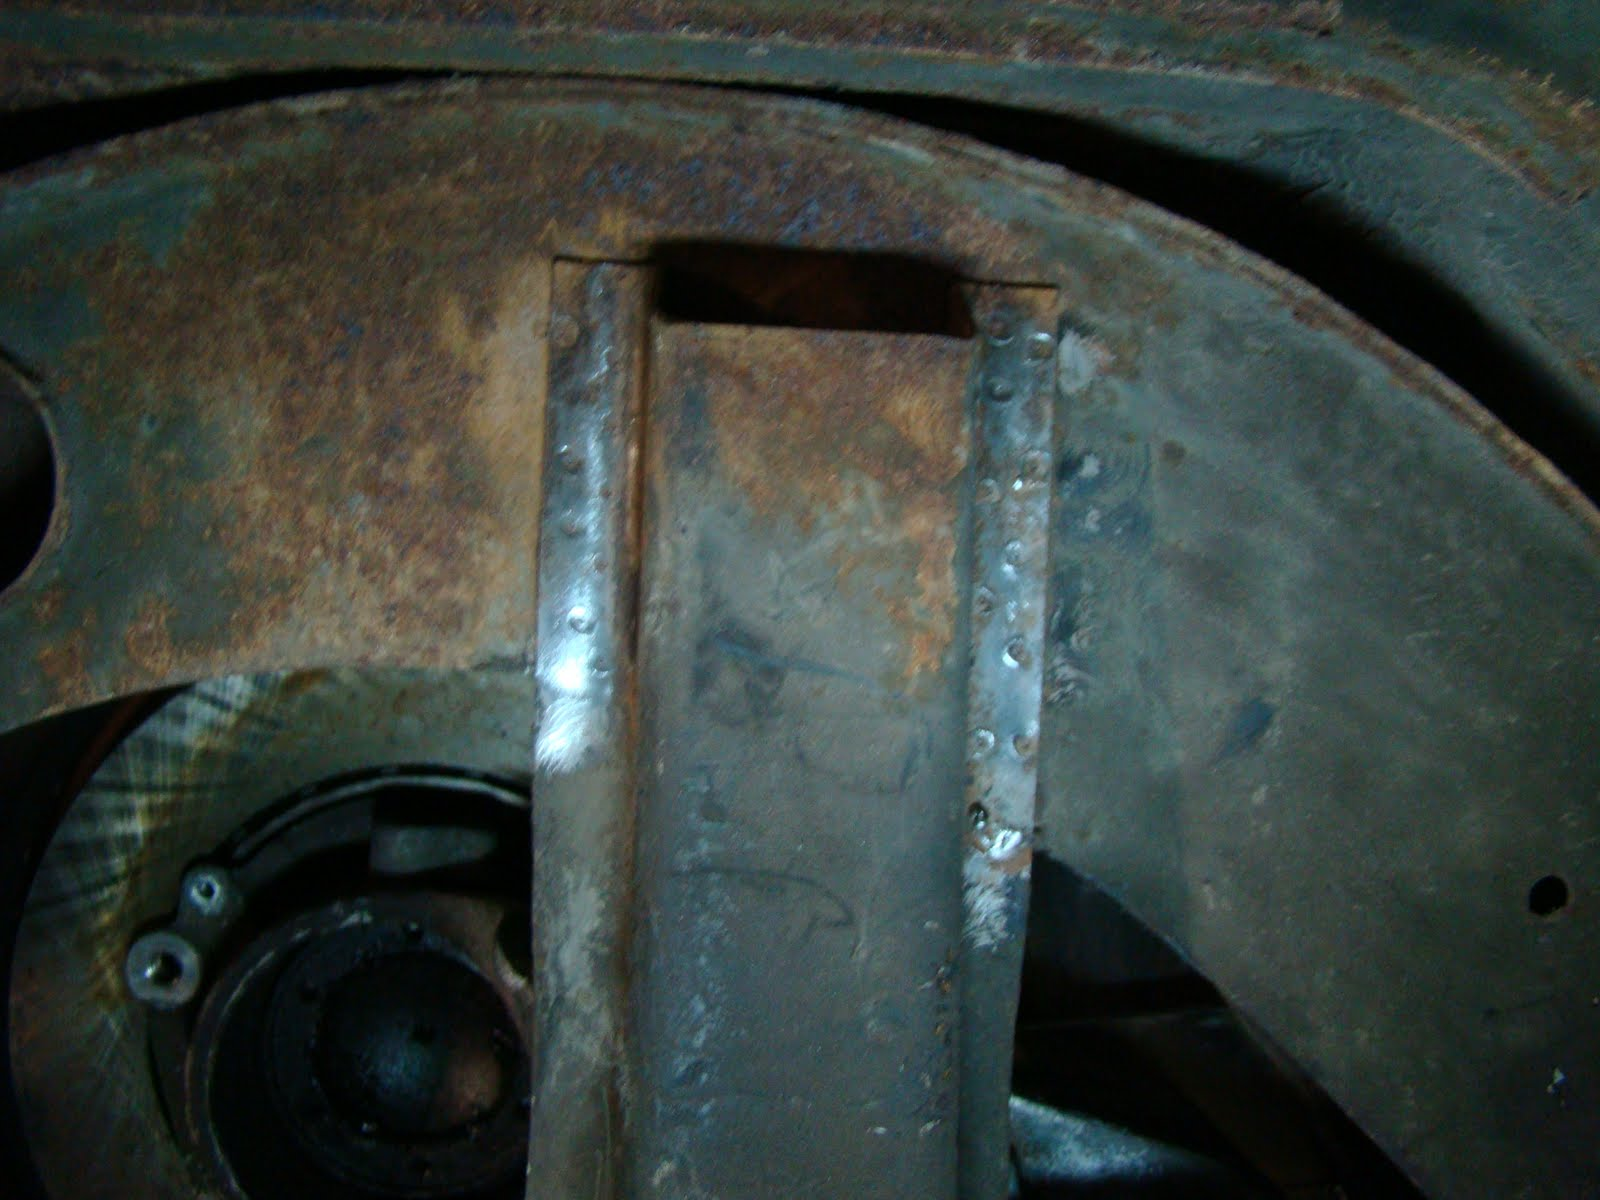 Pauls splitscreen van project: Rear Shock Mount Fitting for 944 IRS